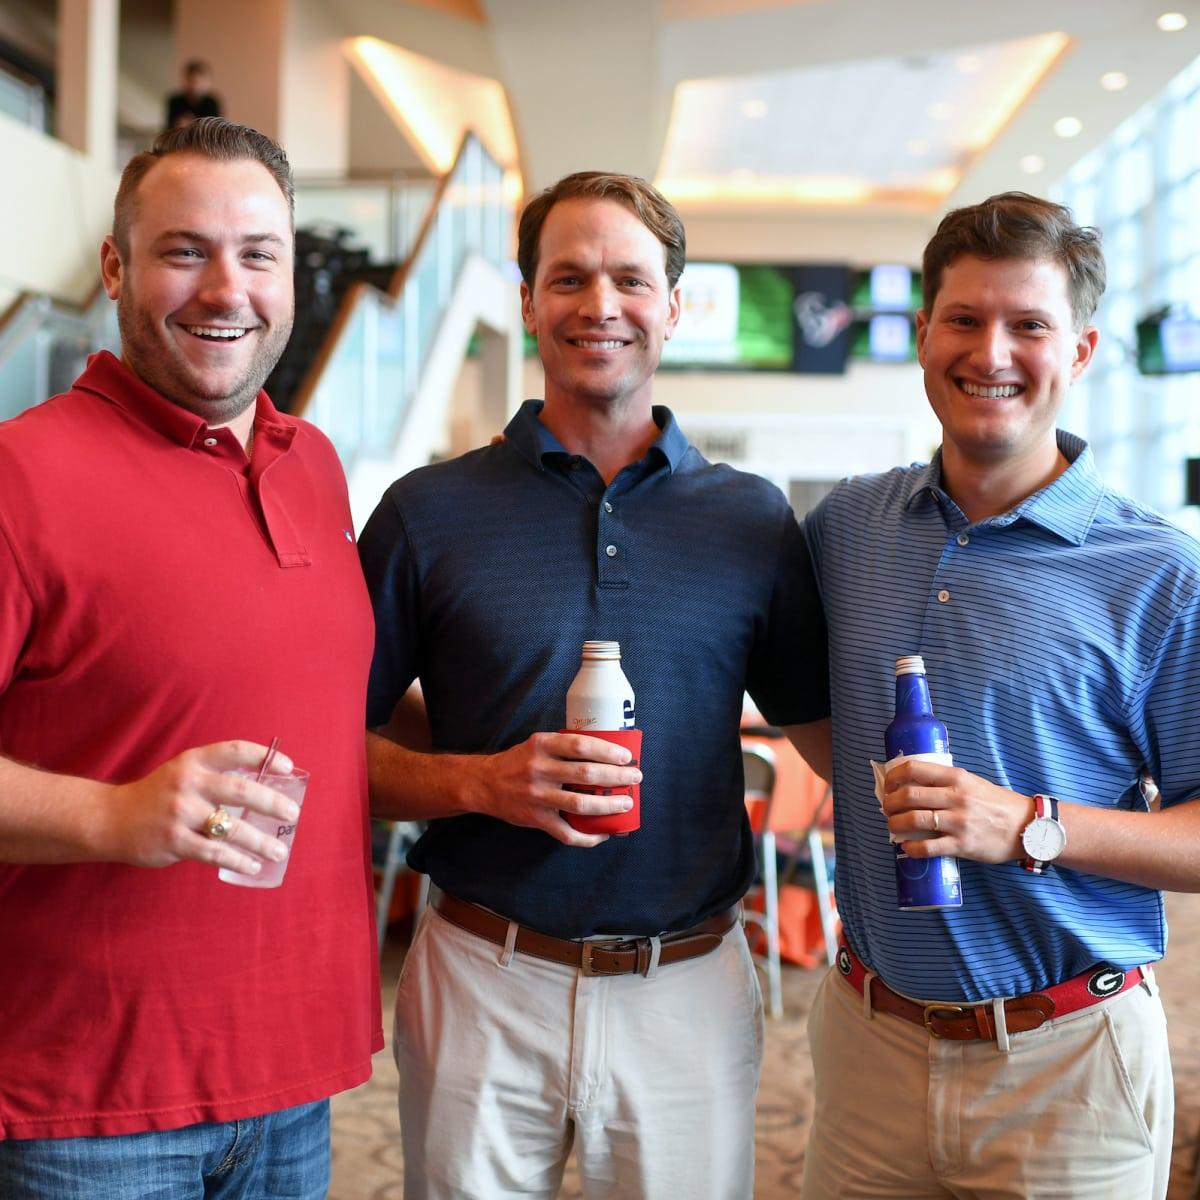 Houston, Boys and Girls Harbor Fantasy Football Draft Night, Steve Cannon, Brian Benoit, Matt Garza